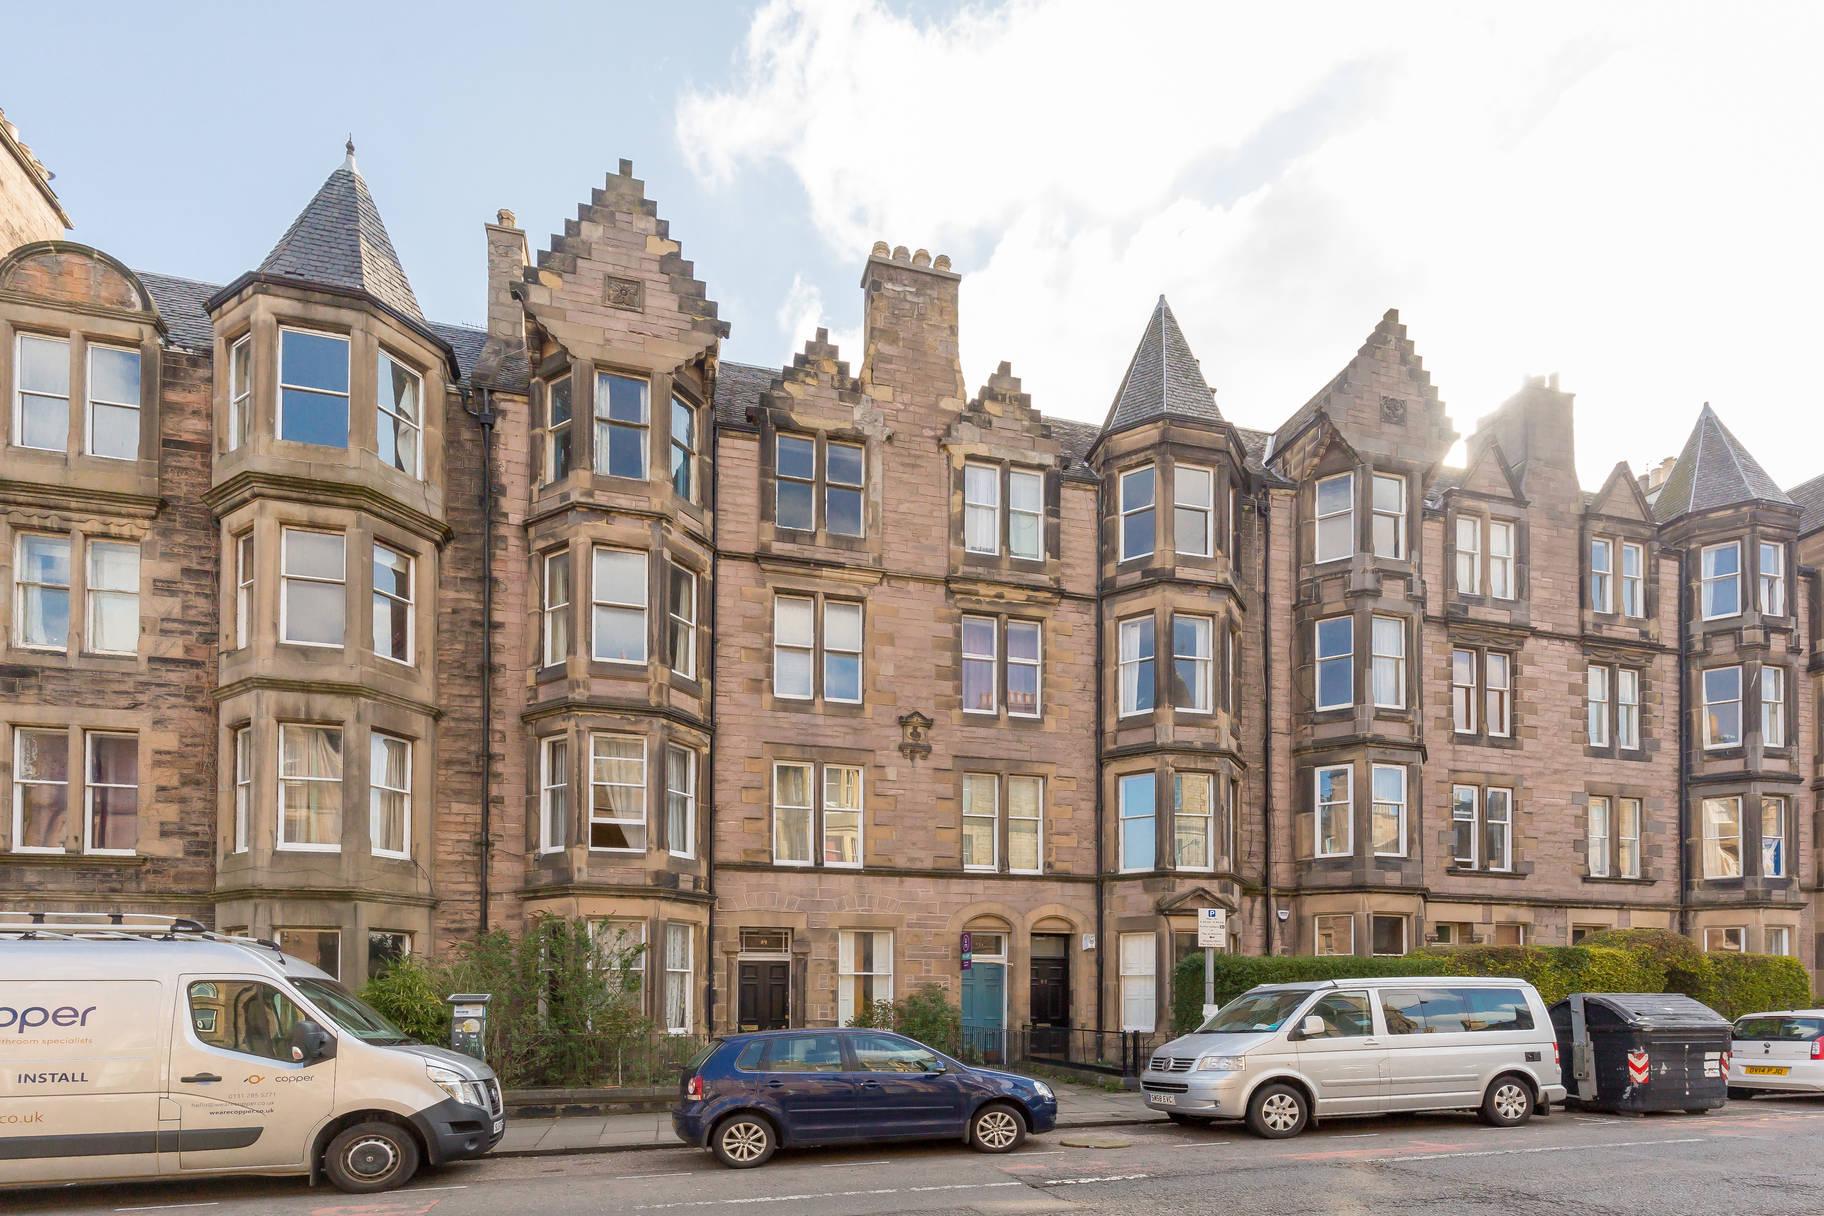 91 (3F1) Marchmont Road, Edinburgh, EH9 1HB